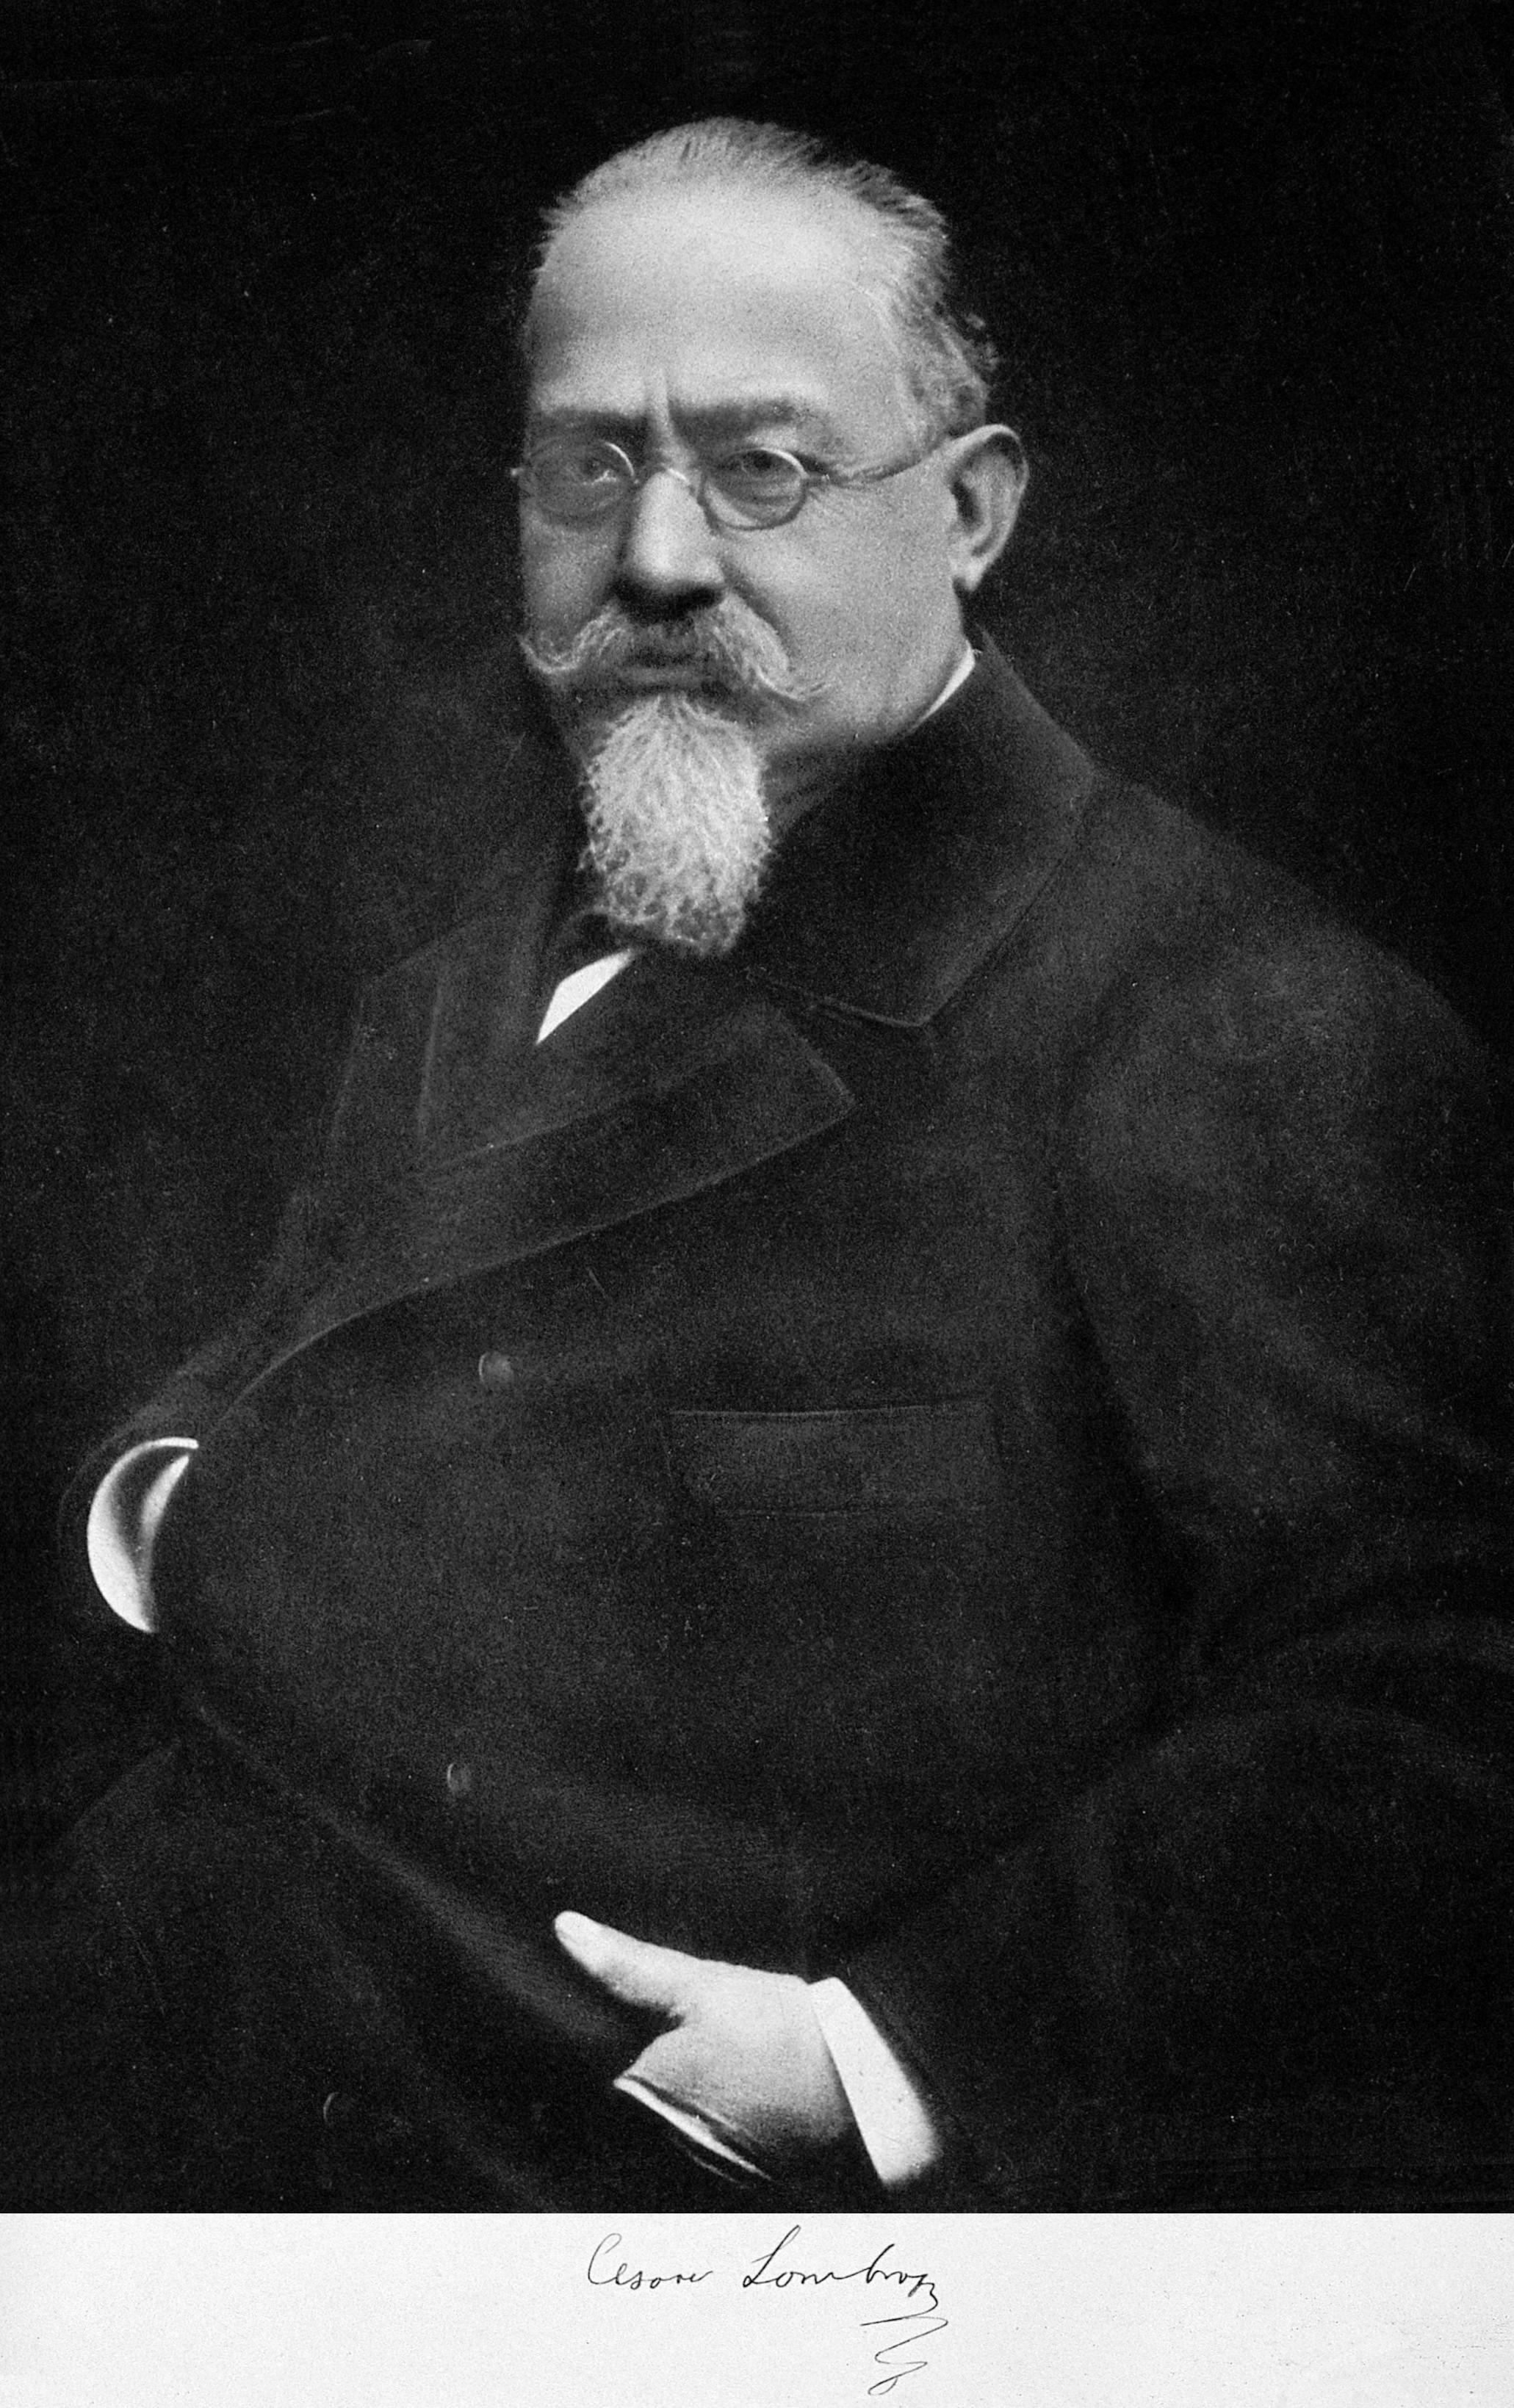 cesare lombroso Lombroso definition, cesare [che-zah-re] /ˈtʃɛ zɑˌrɛ/ (show ipa), 1836–1909, italian physician and criminologist see more.